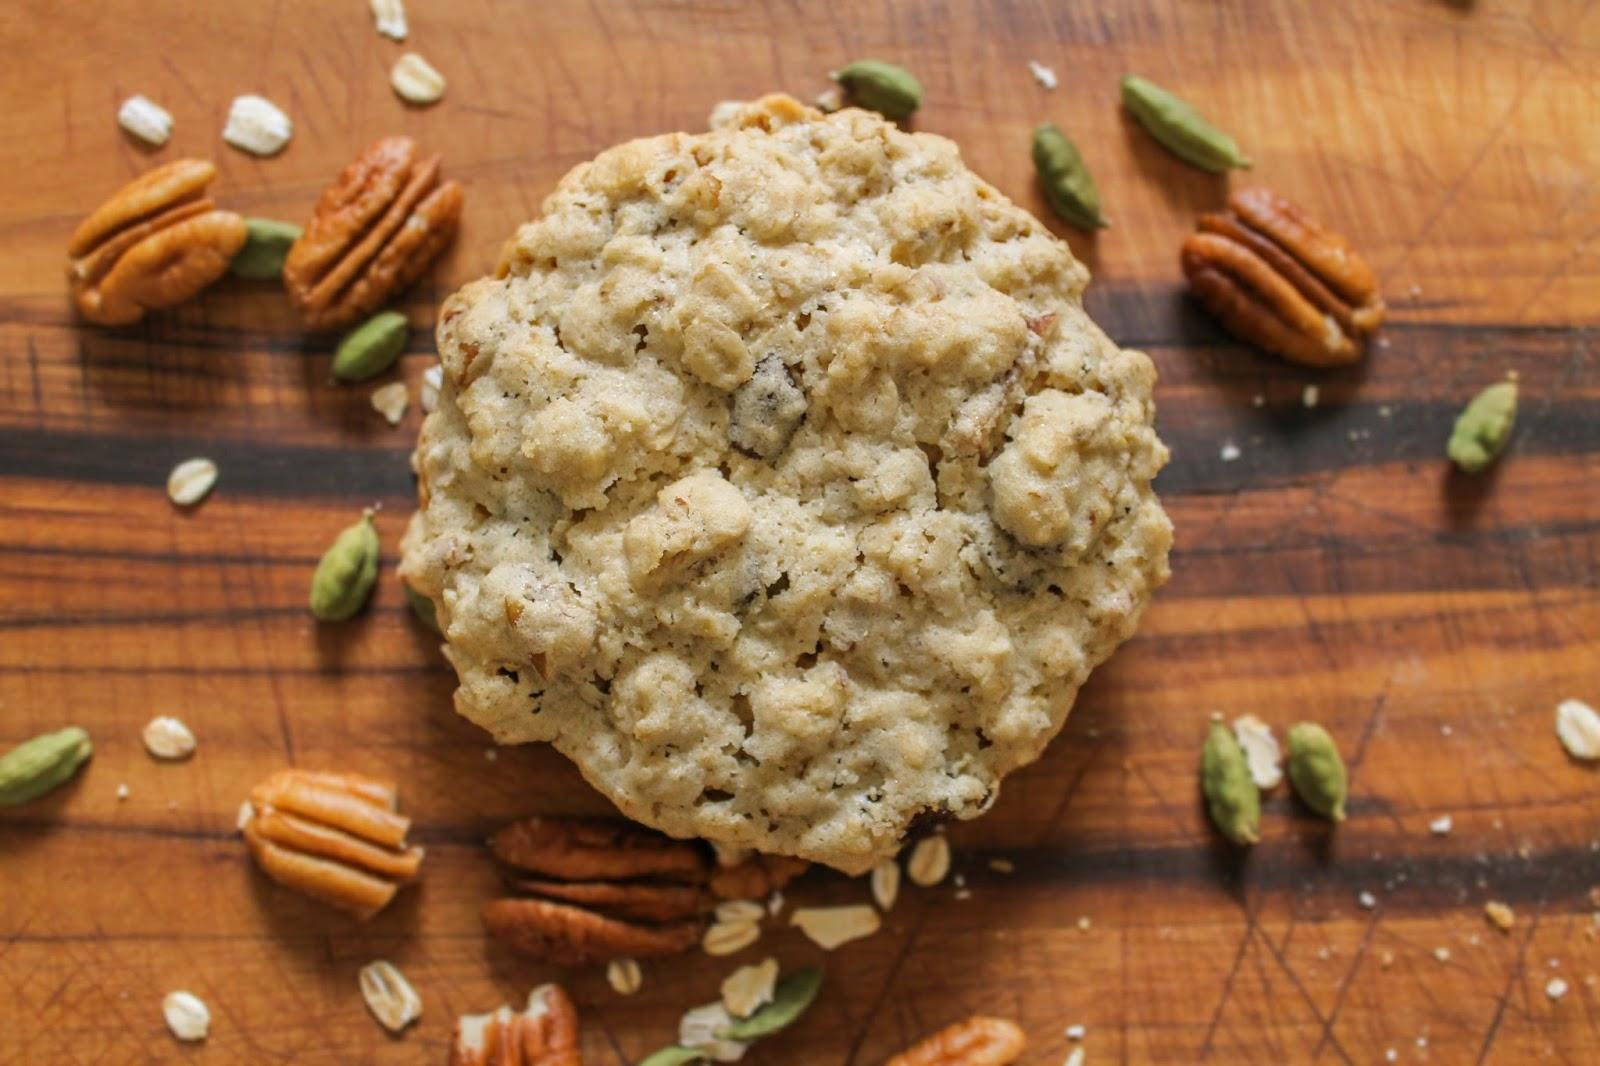 The Quixotic Table: Oatmeal Raisin Pecan Cookies